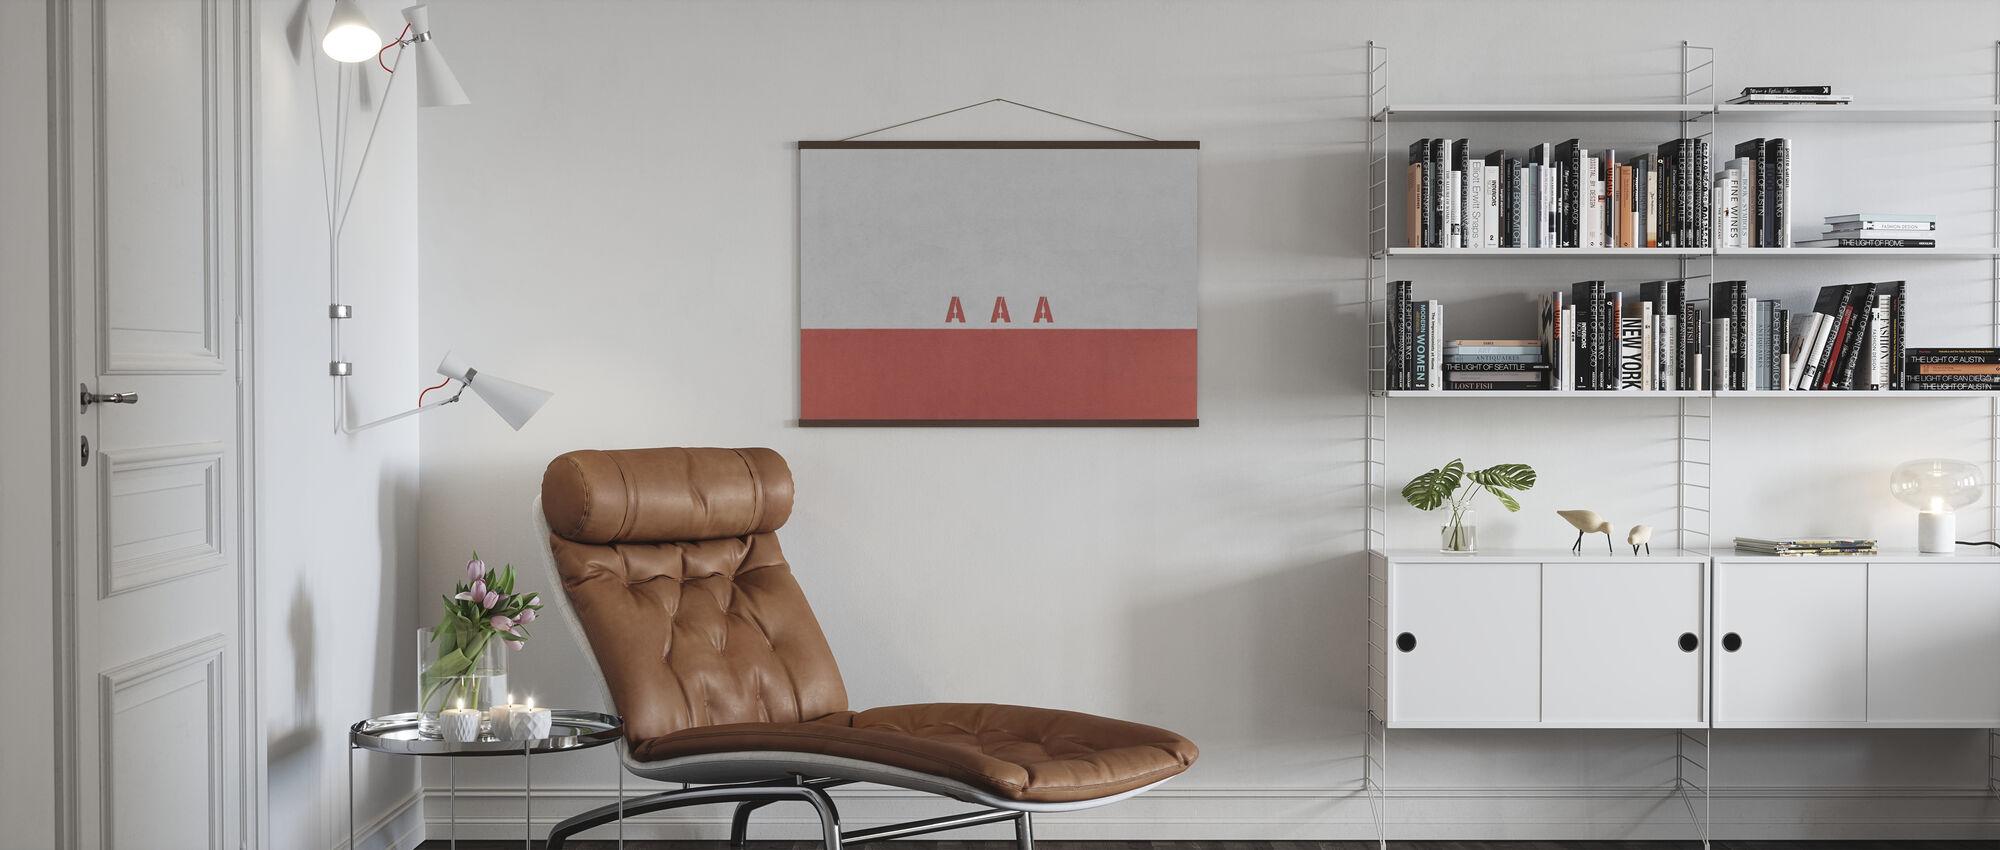 AAA Wall - Poster - Living Room